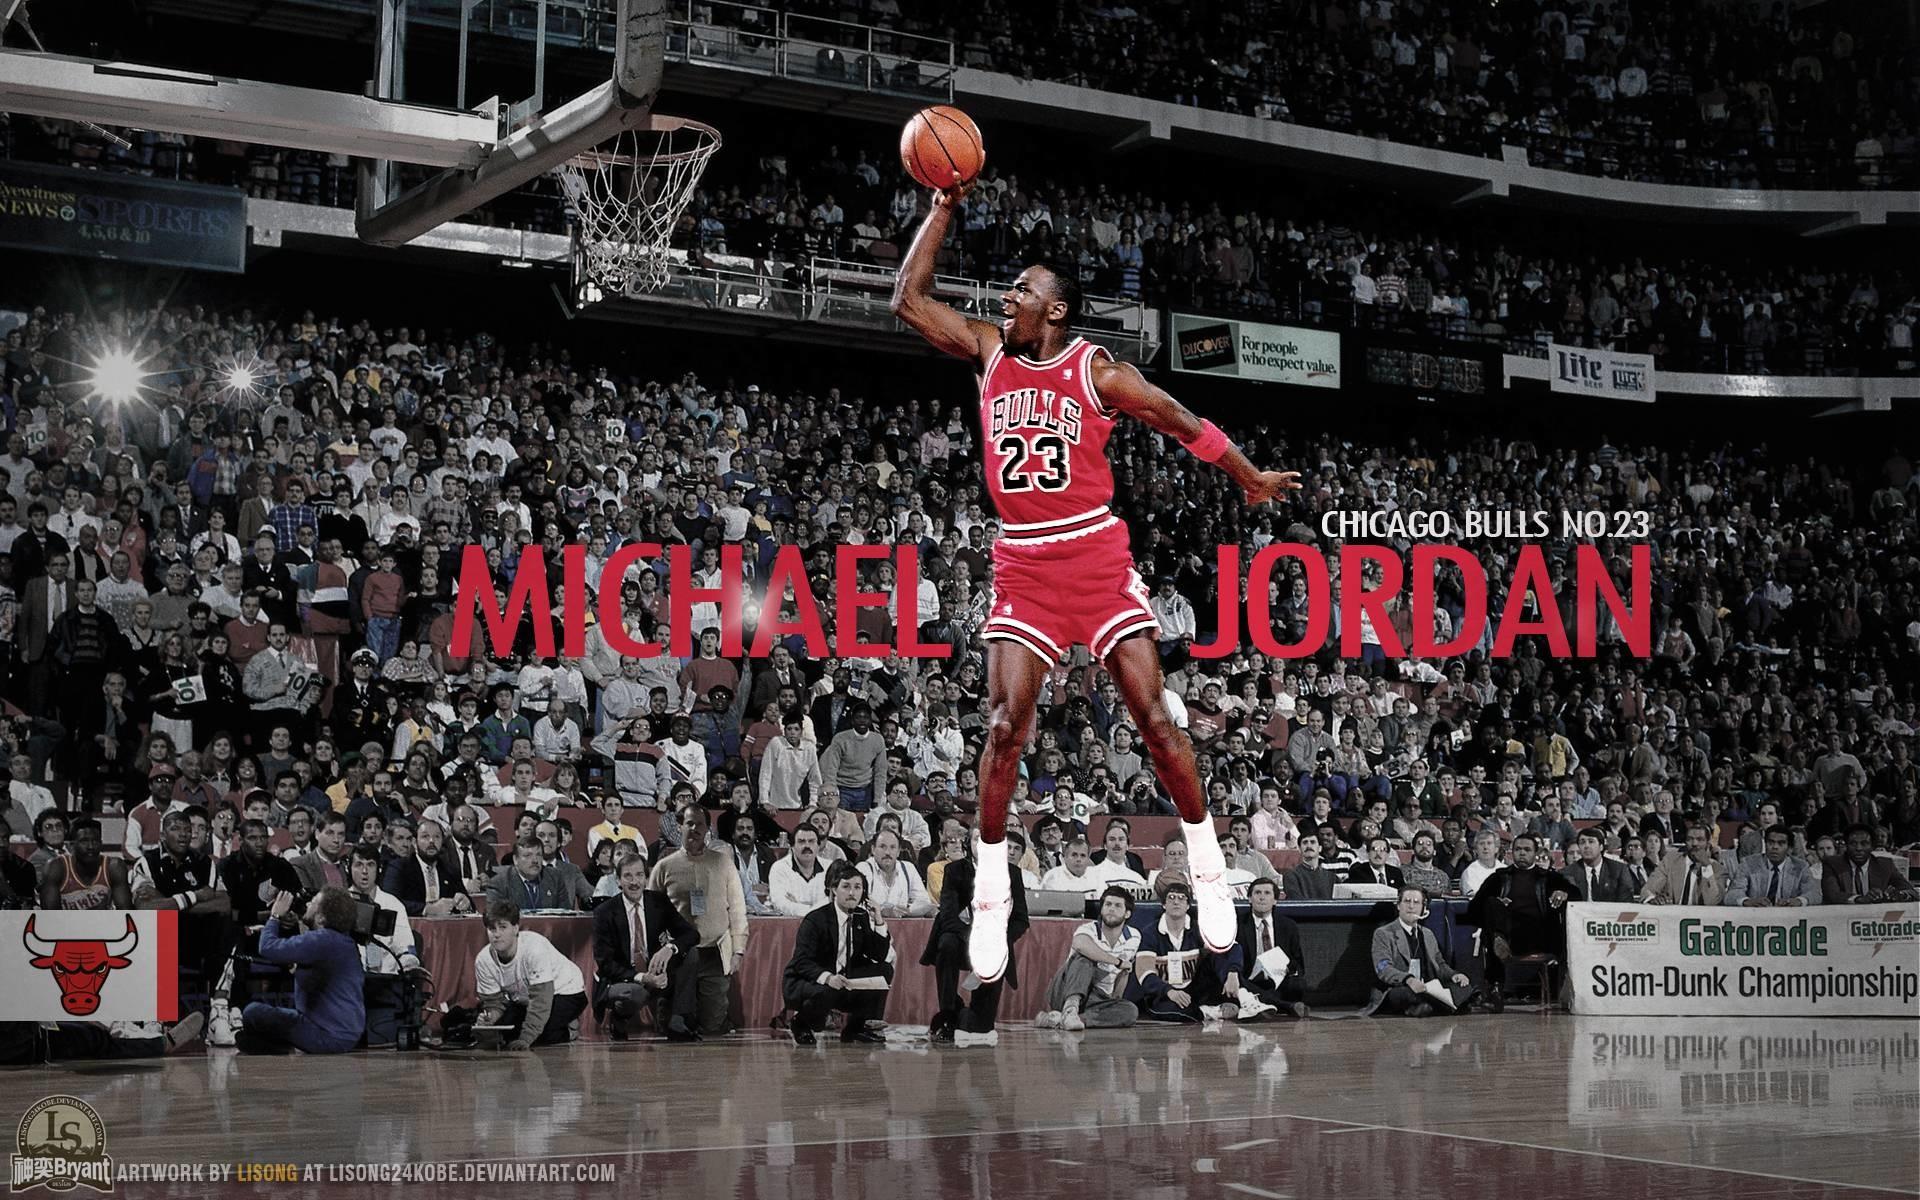 1920x1200 Michael Jordan Wallpapers Hd Hd Cool 7 Hd Wallpapers Hdimges